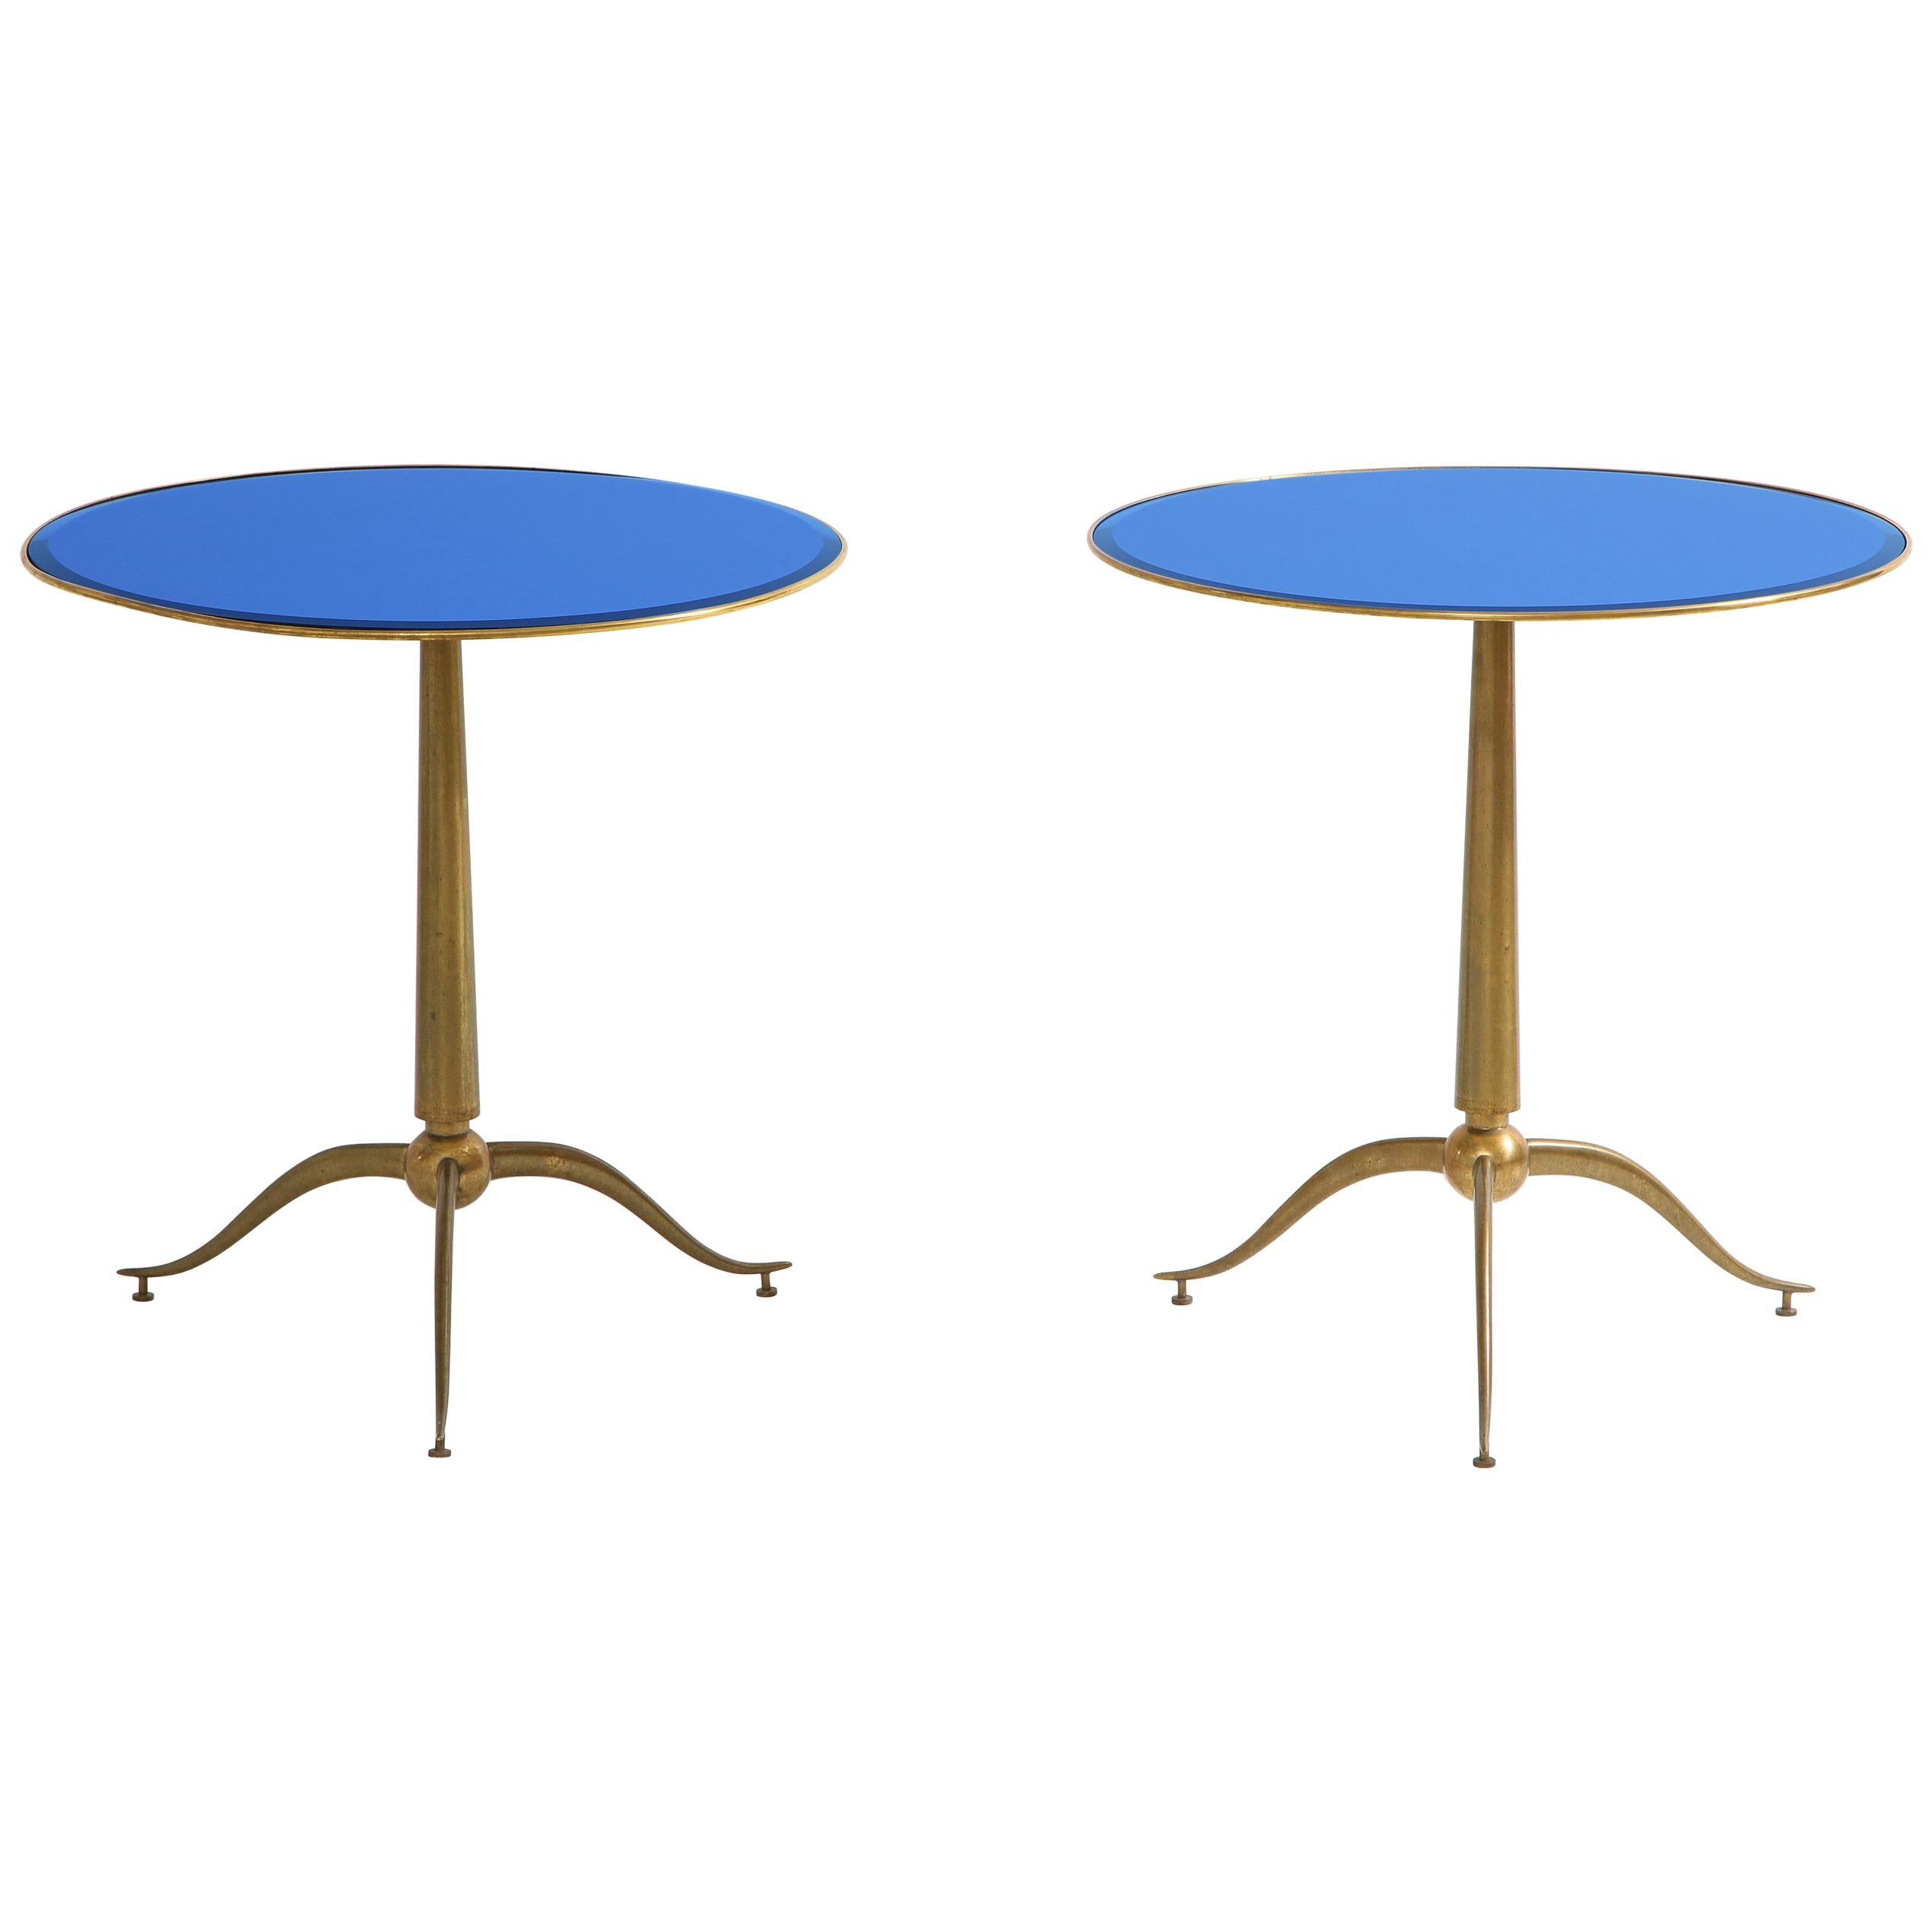 Osvaldo Borsani Rare Pair of Side Tables in Brass and Blue Glass